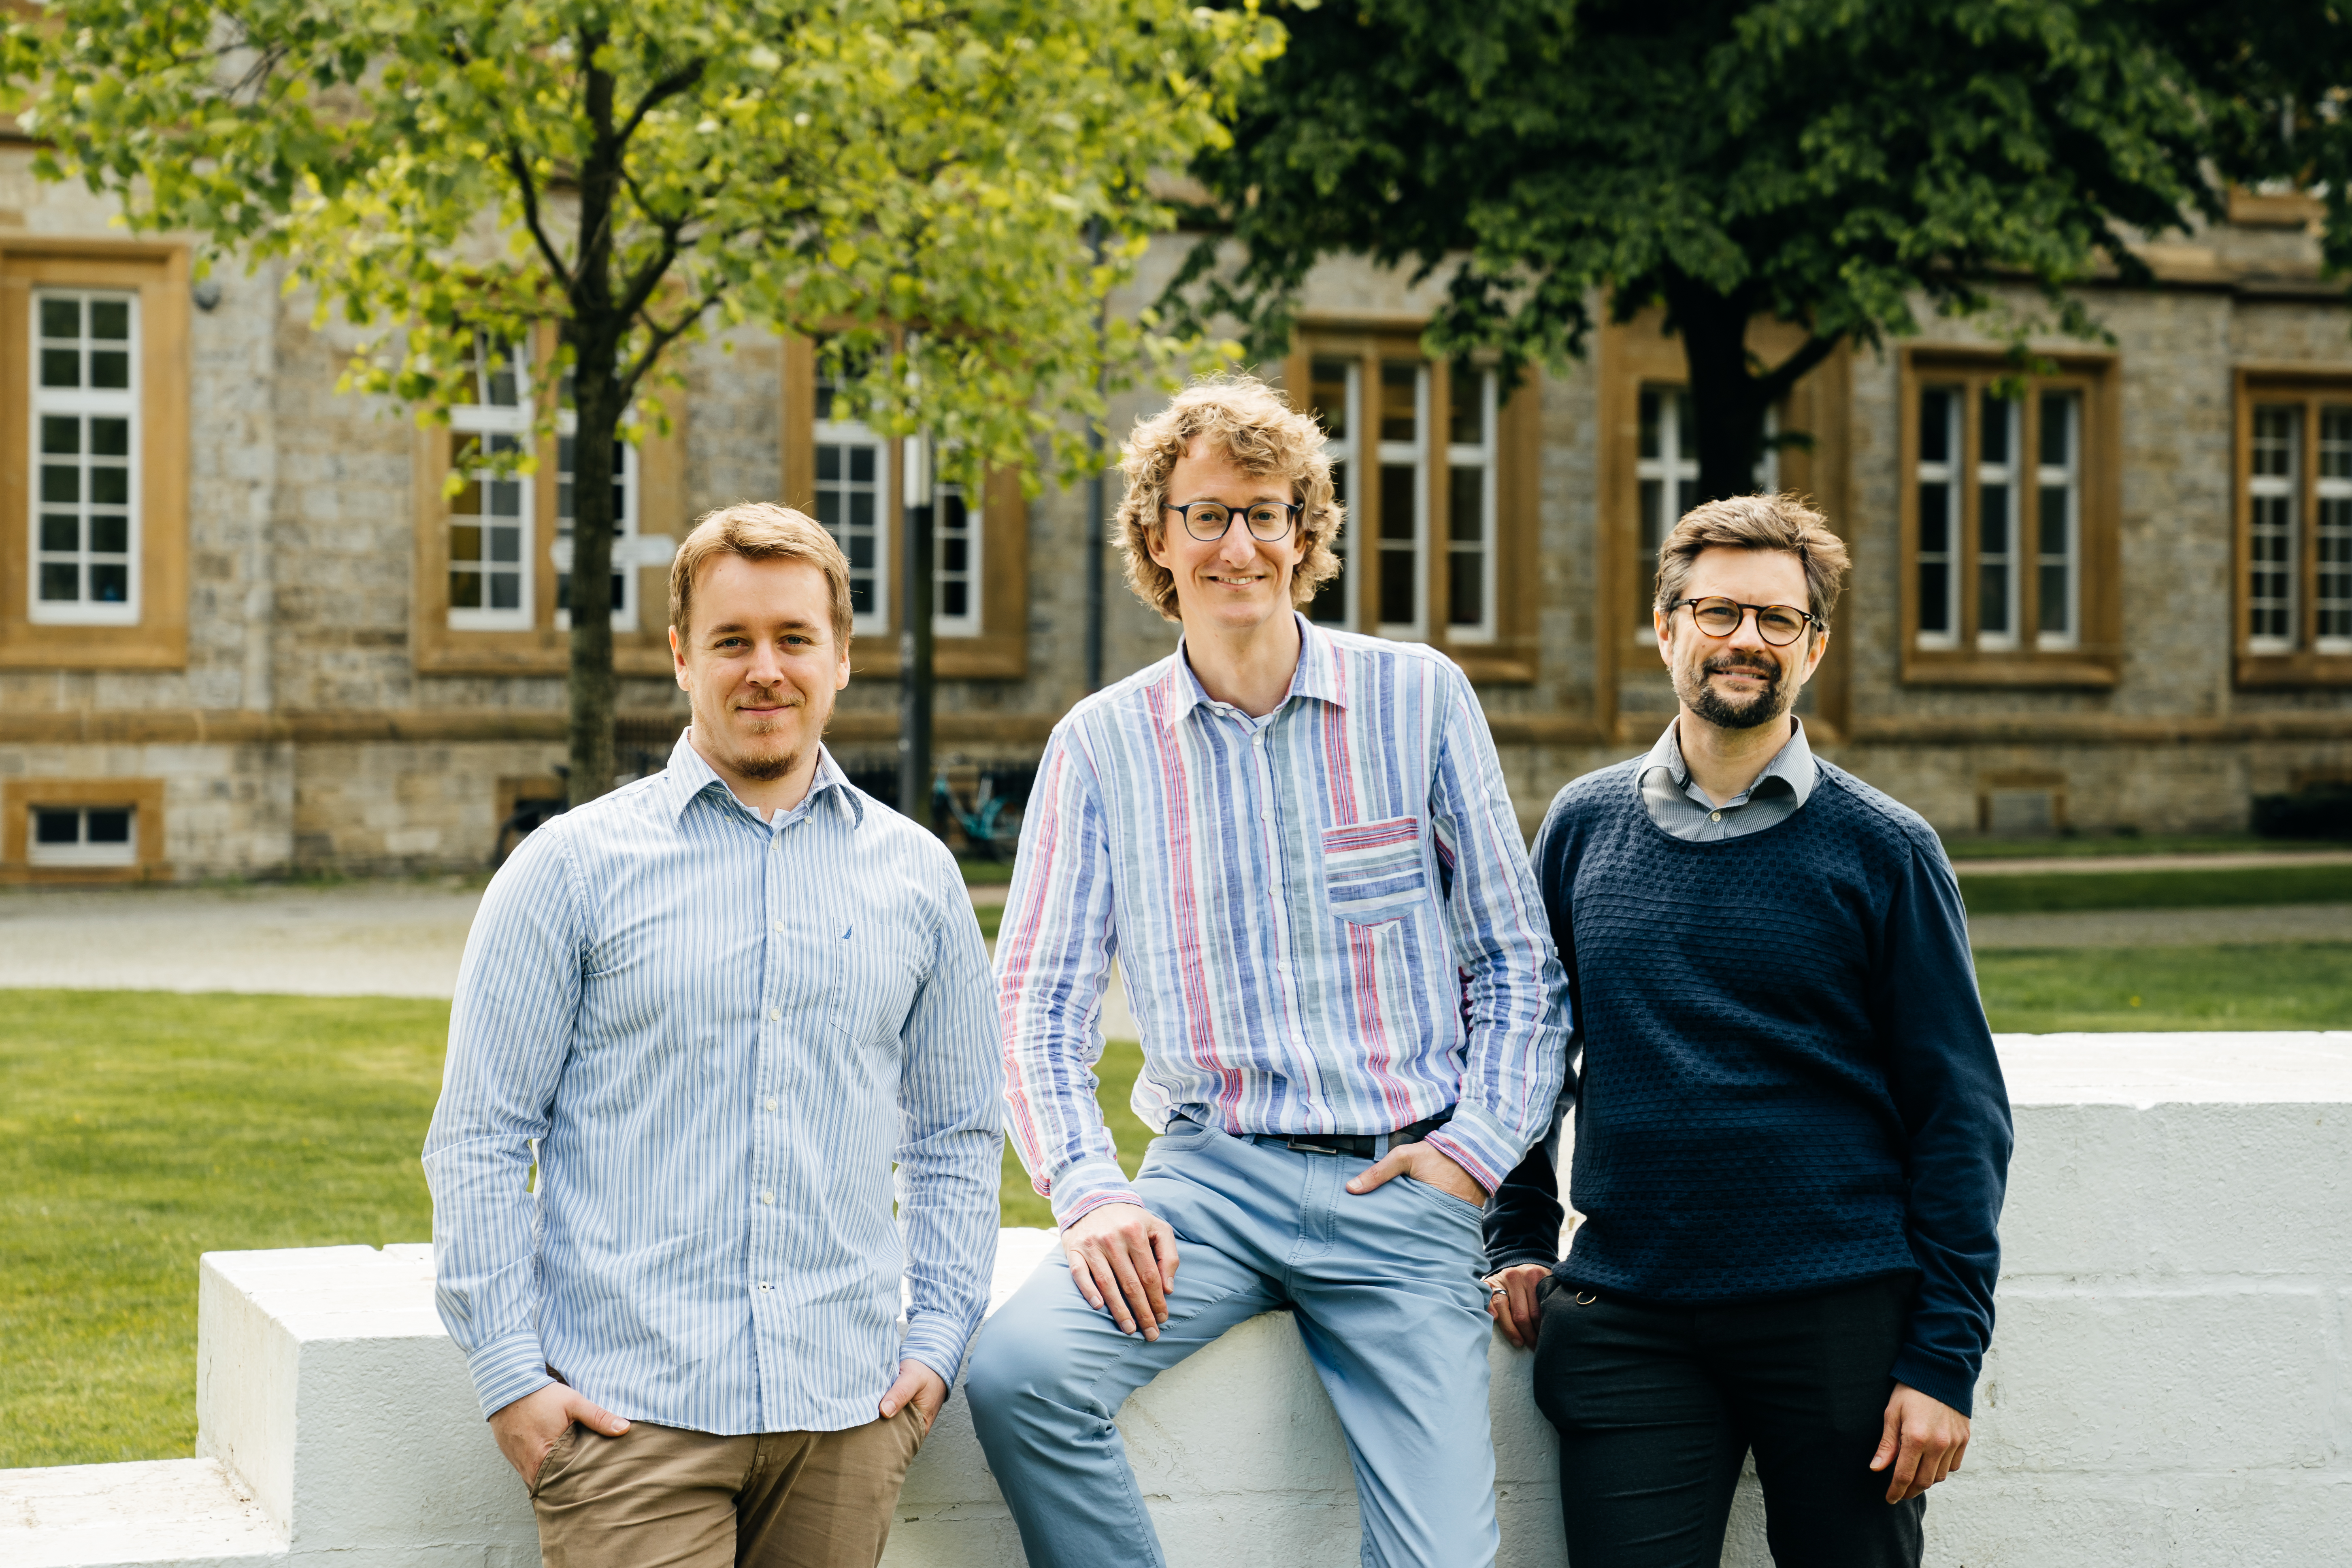 Semalytix Founders Janik Jaskolski, Matthias Hartung, Philipp Cimiano